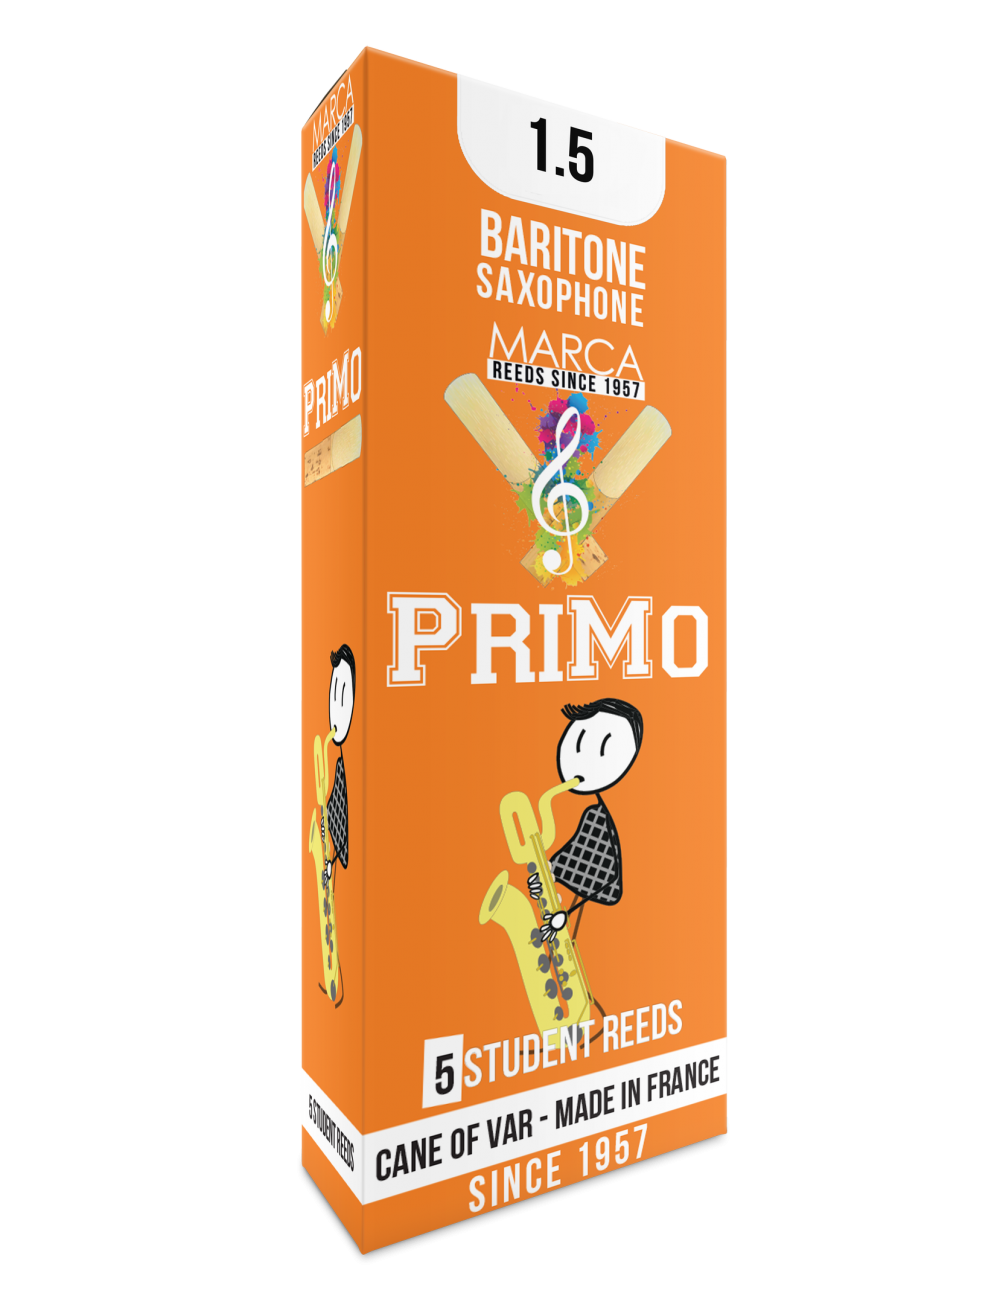 10 REEDS MARCA PriMo BARITONE SAXOPHONE 1.5